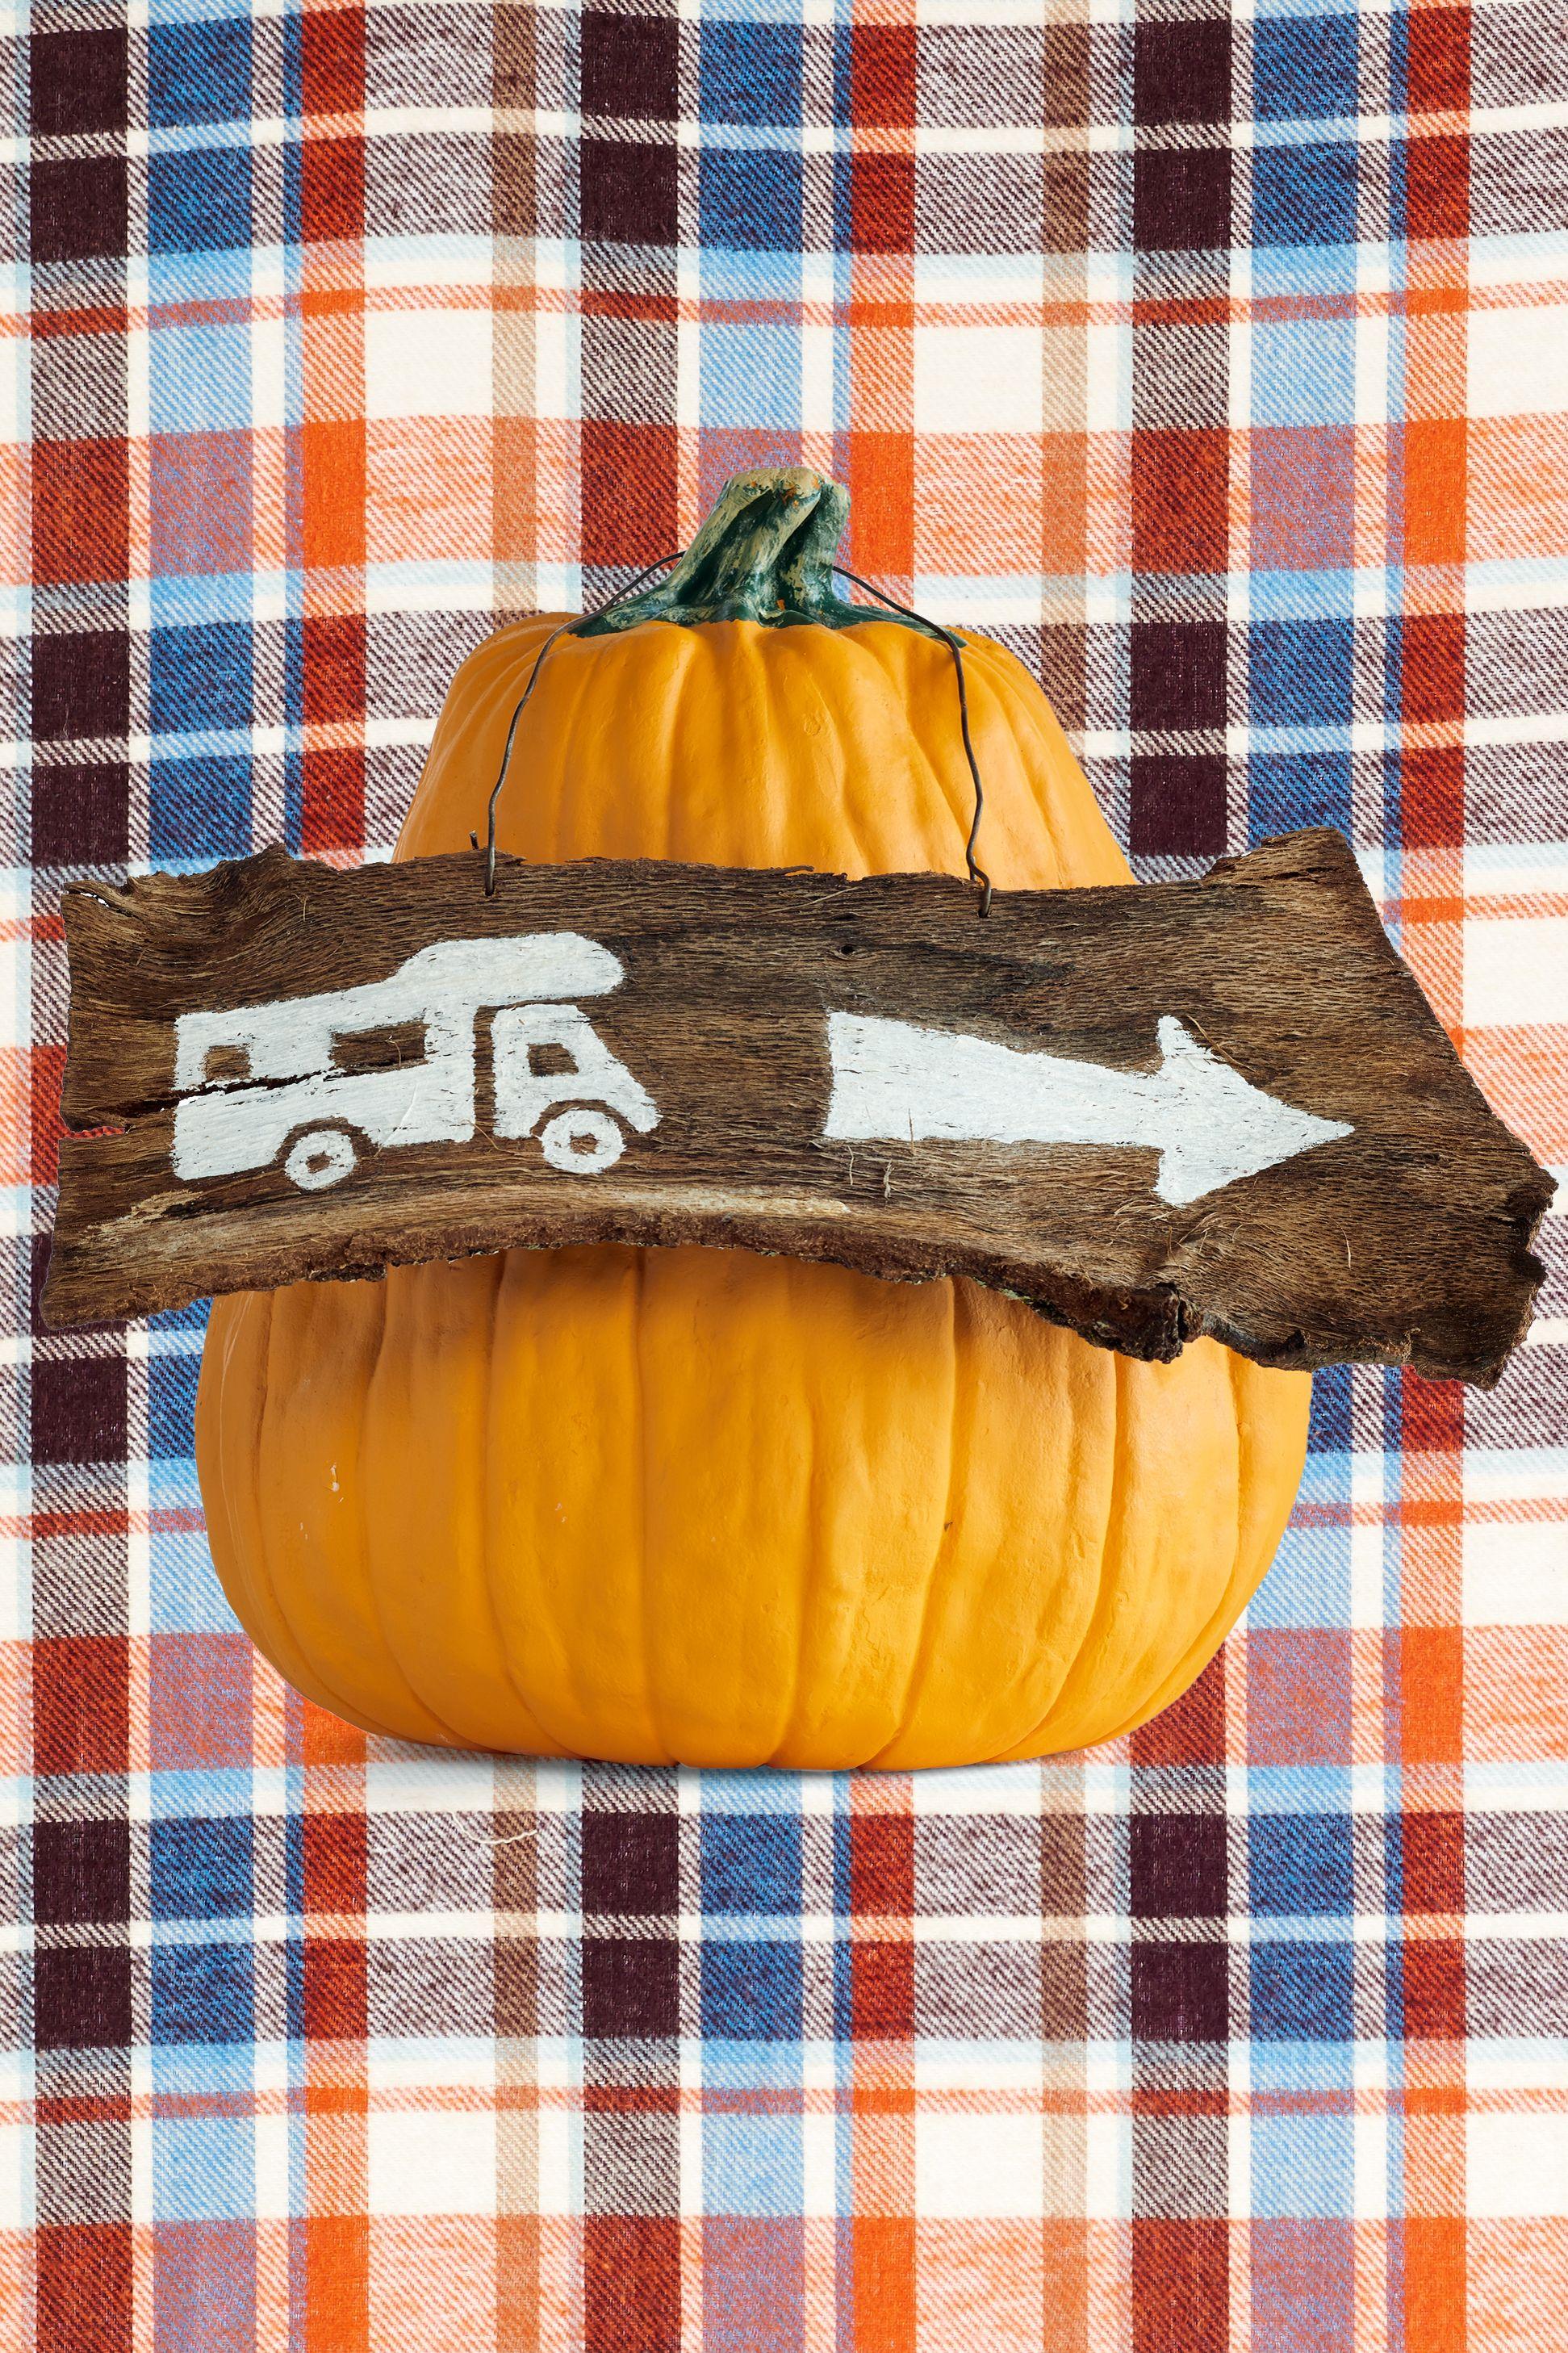 65 Easy Painted Pumpkins Ideas - No Carve Halloween Pumpkin Painting ...